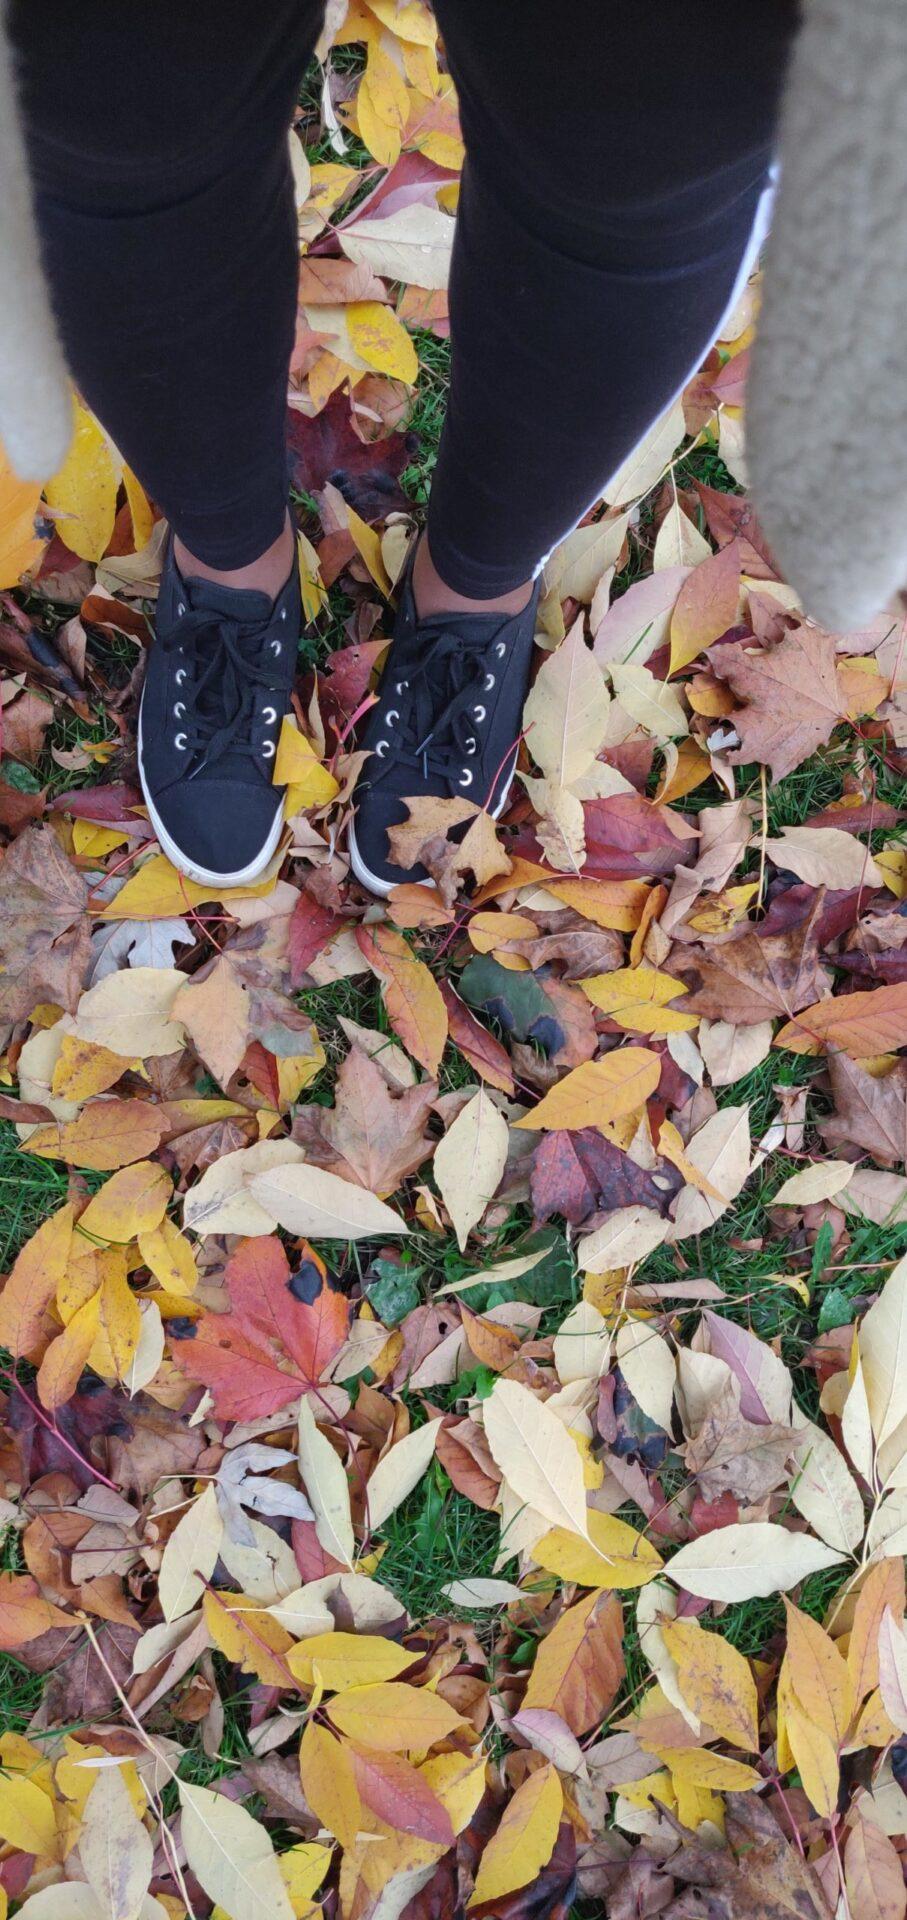 destiny's legs in fall leaves